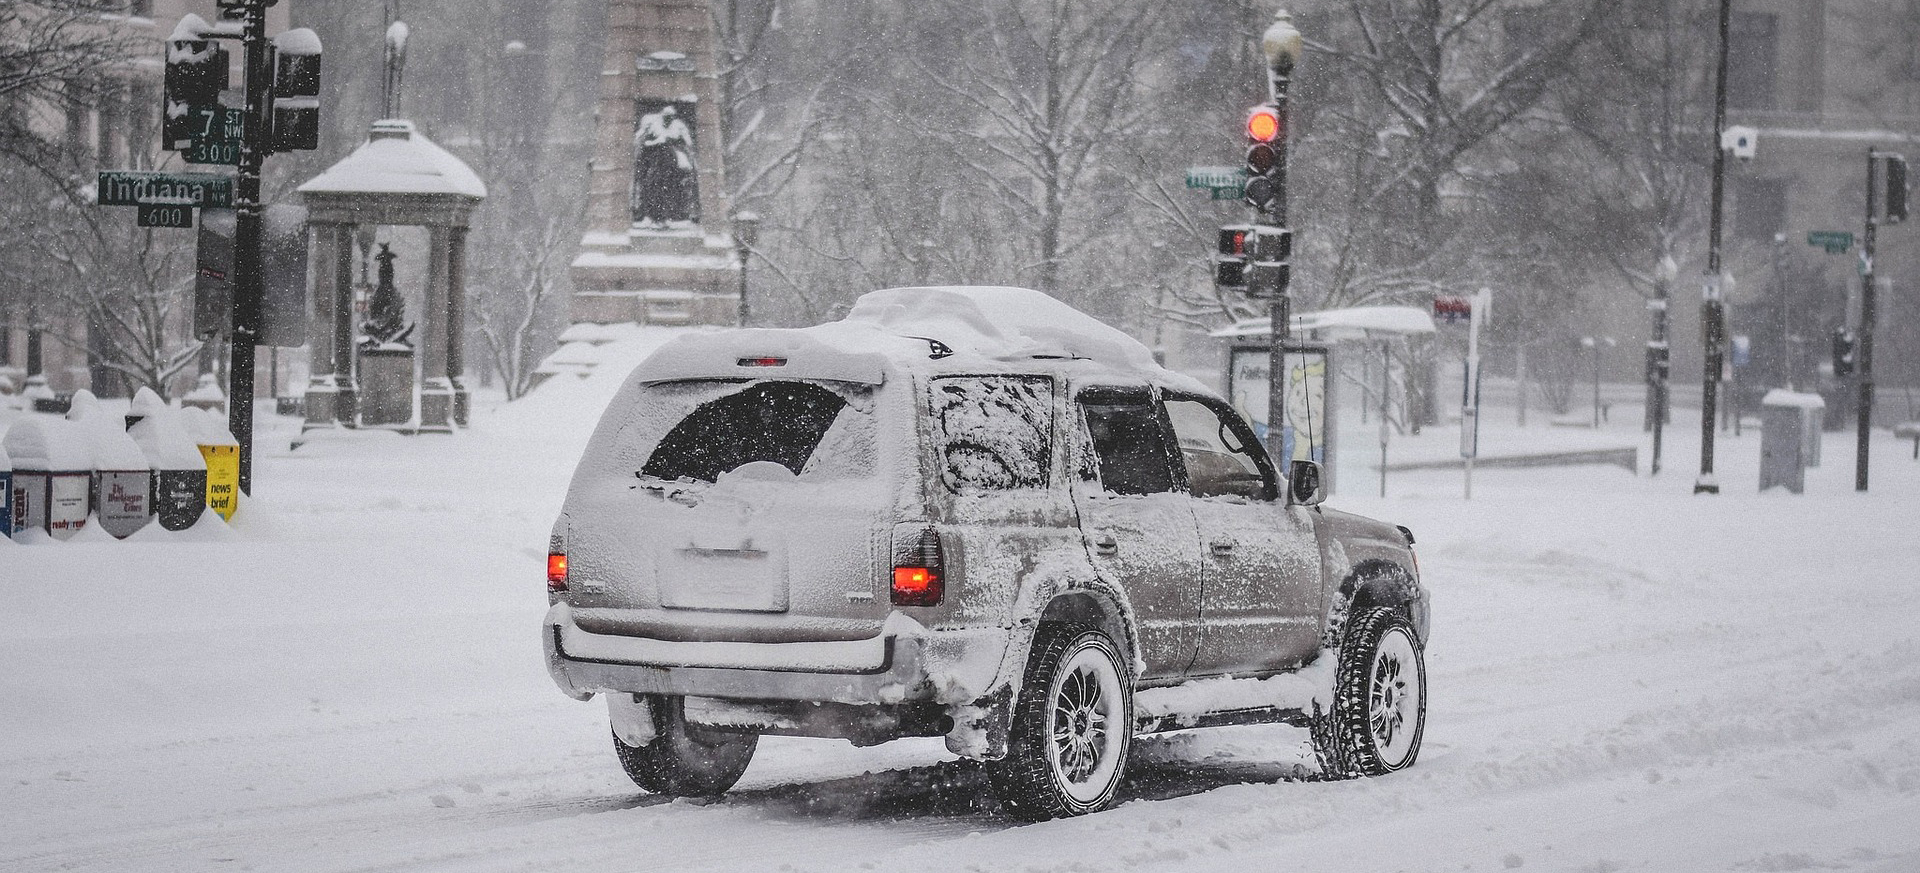 Insurance Recreational Vehicle